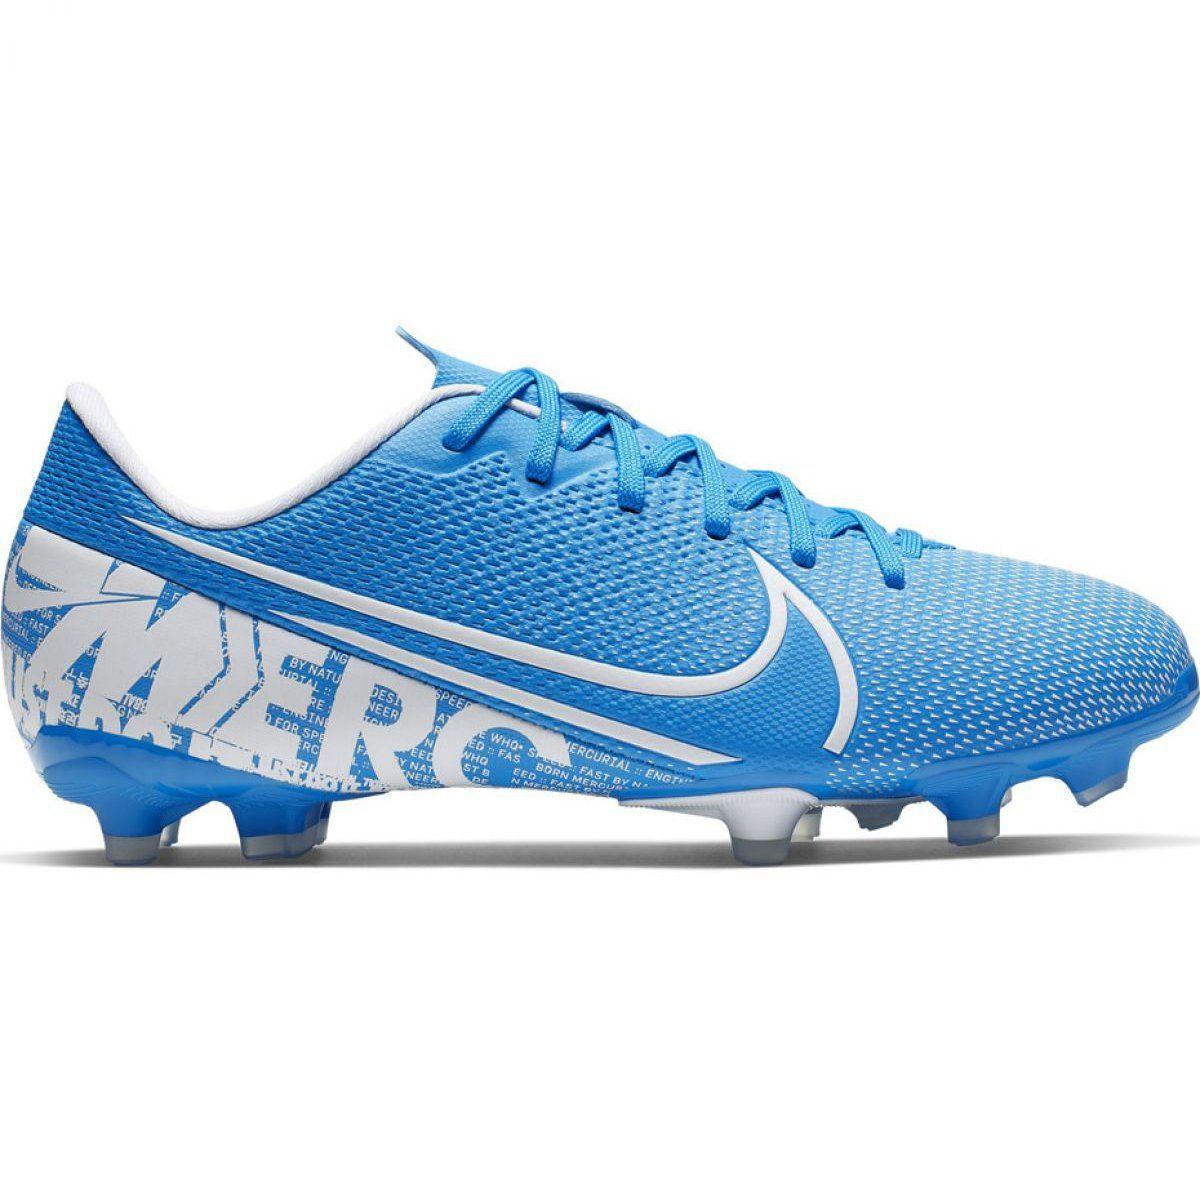 Football Boots Nike Mercurial Vapor 13 Academy Fg Mg Jr At8123 414 Blue Football Shoes Football Boots Nike Shoes